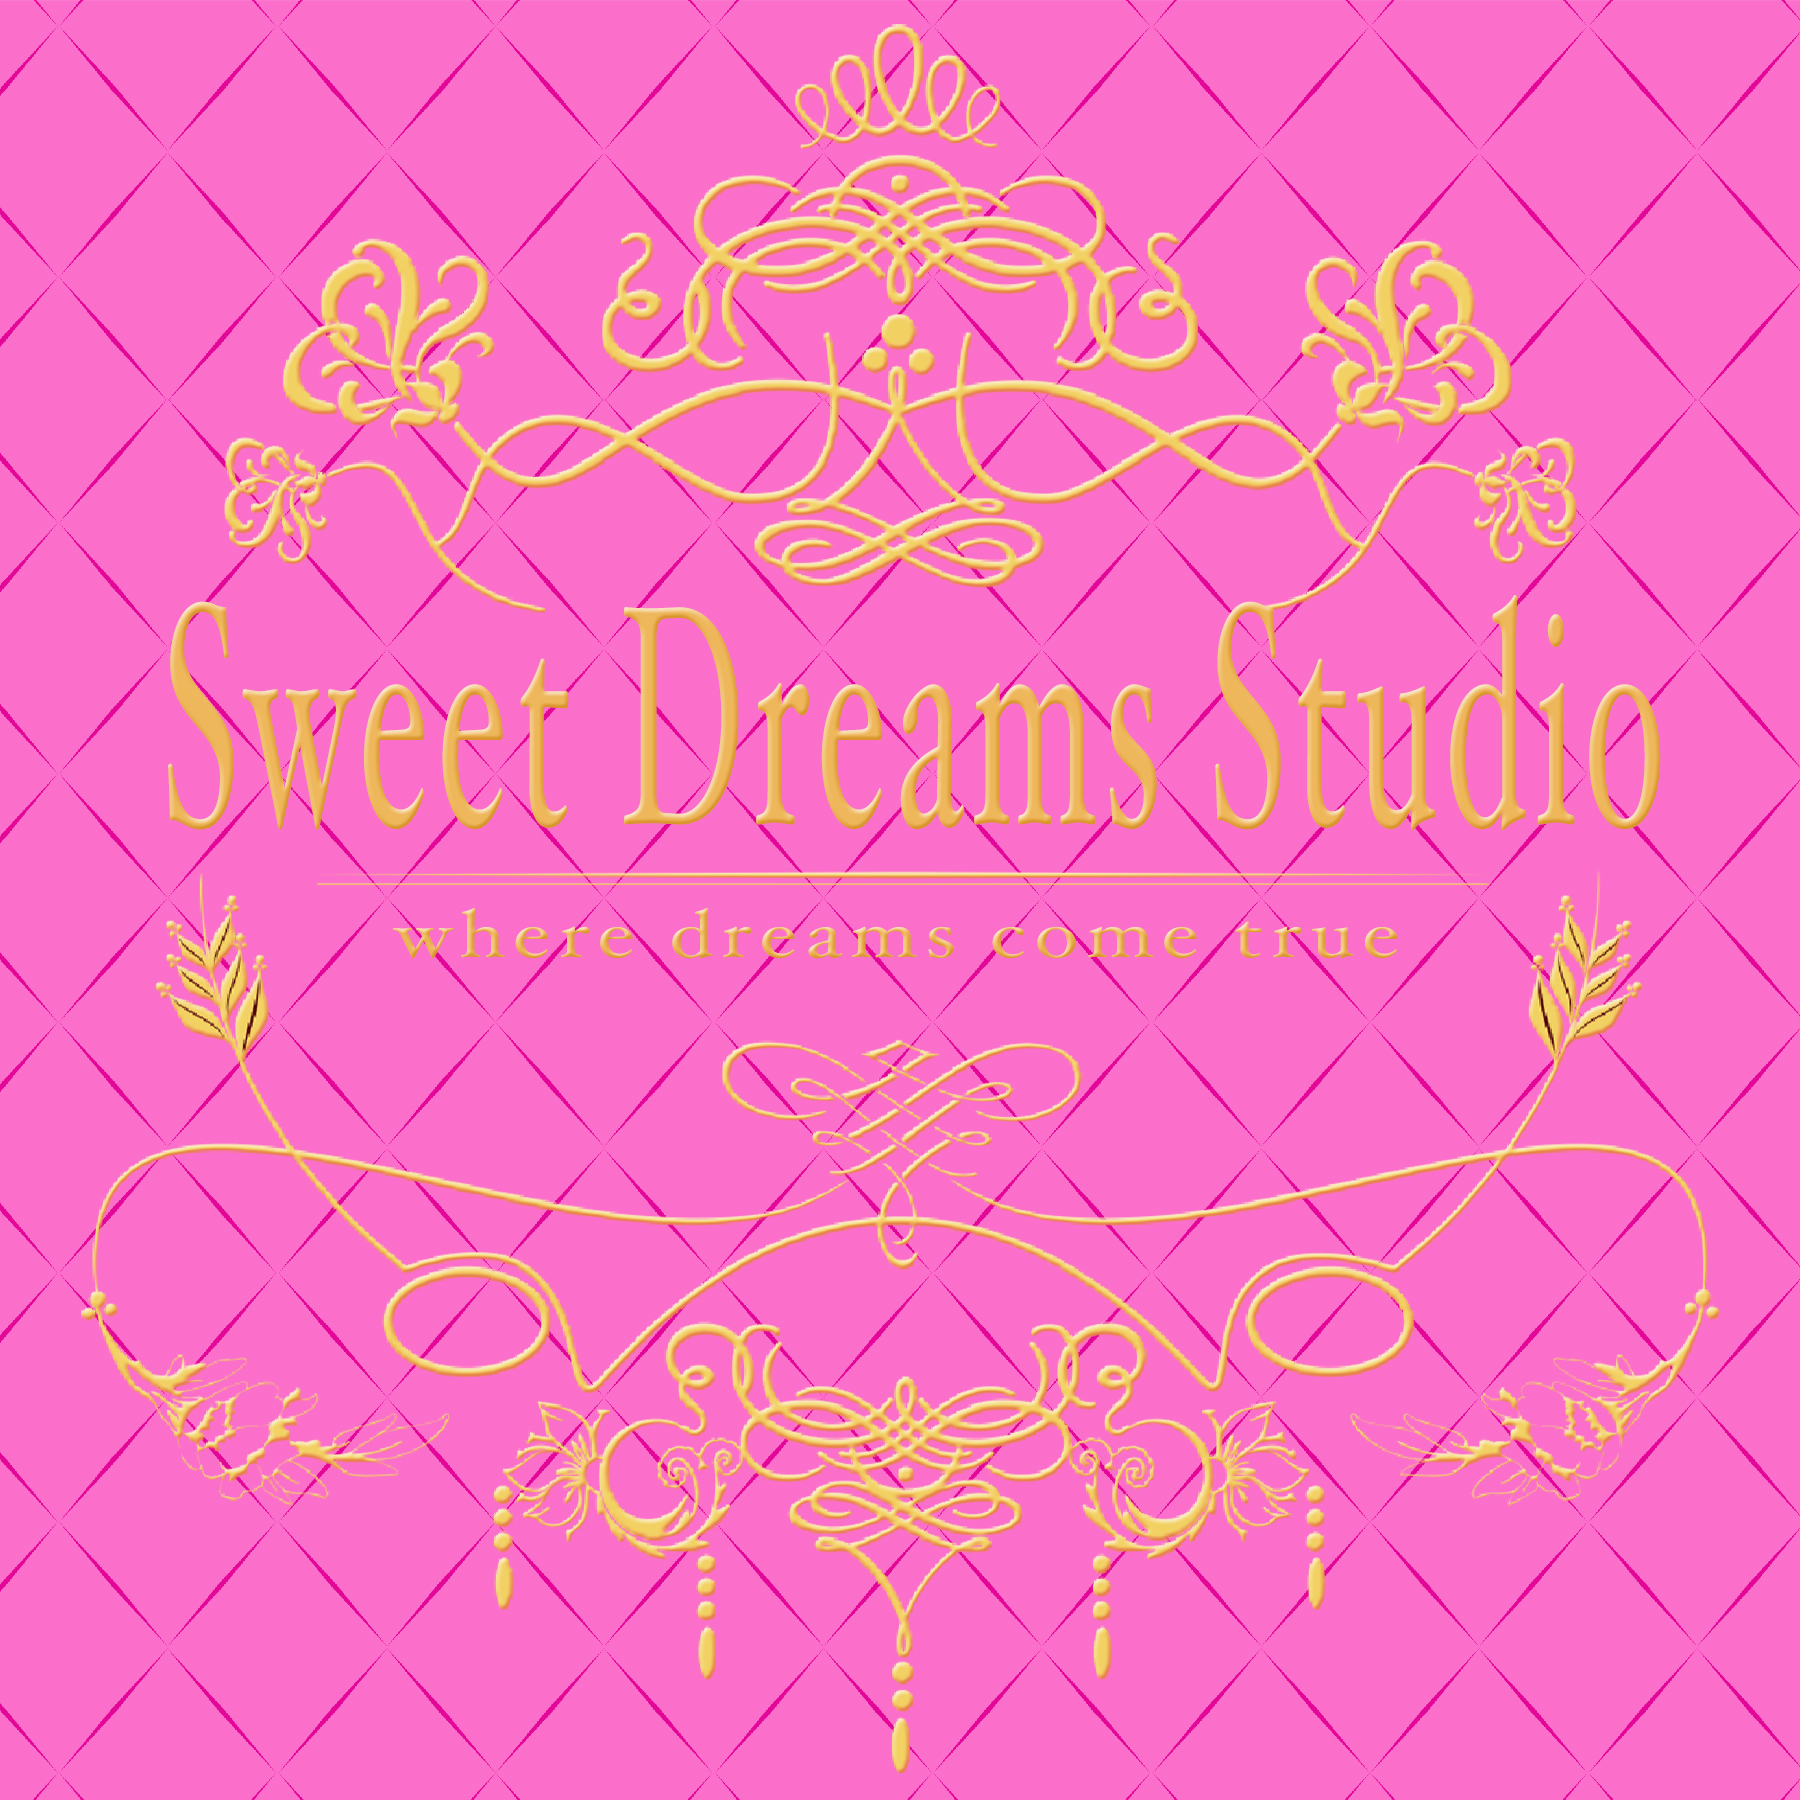 sweetdreamstudio finaldesign.jpg